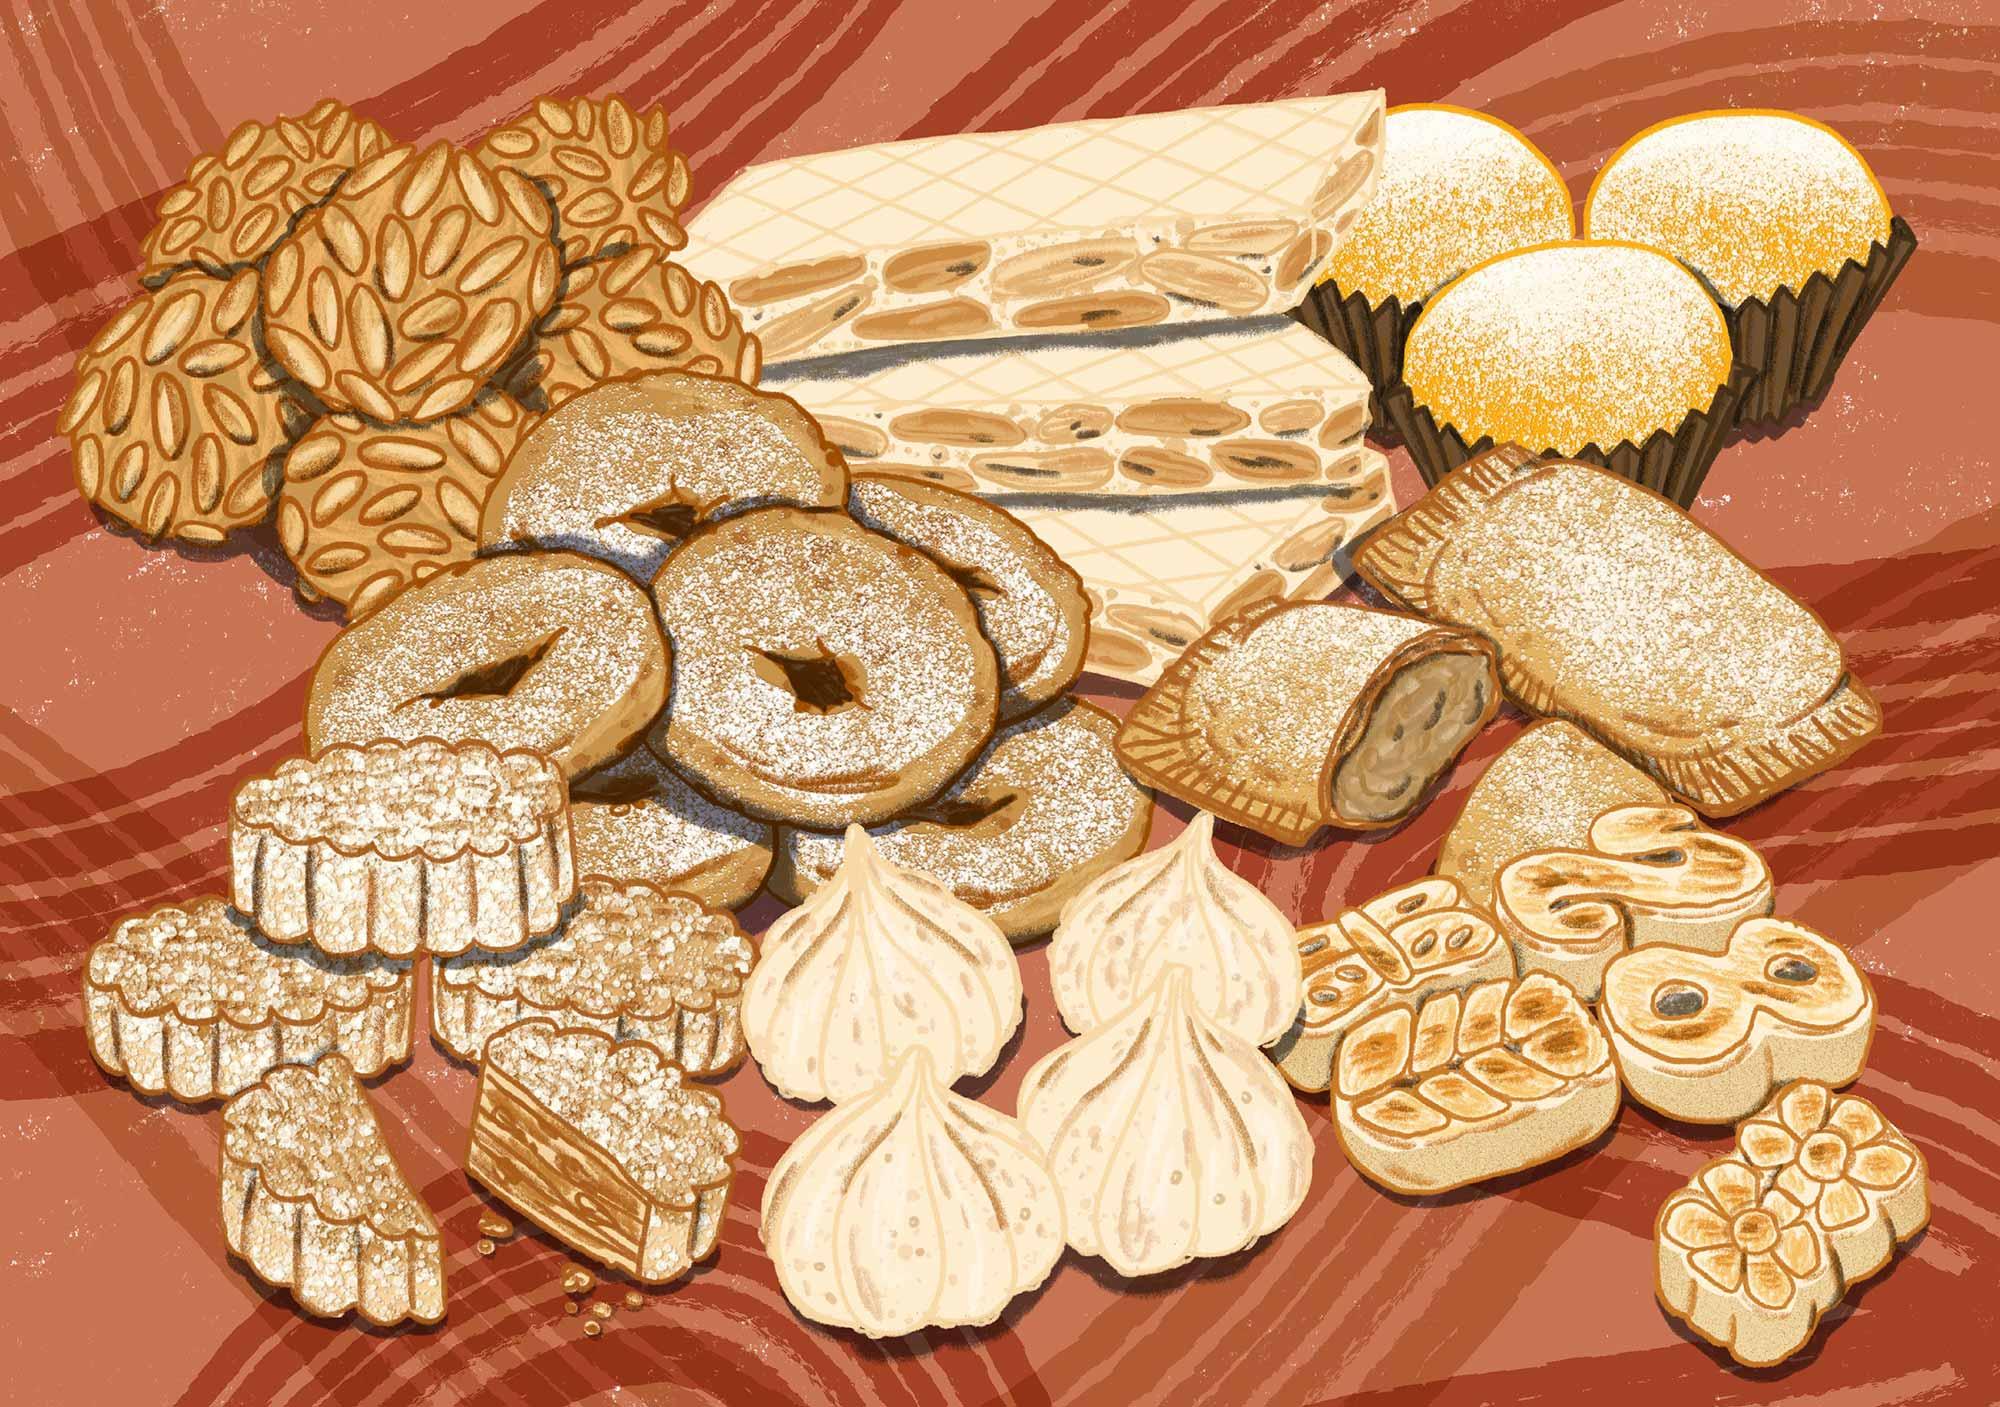 Illustration of Spanish cookies